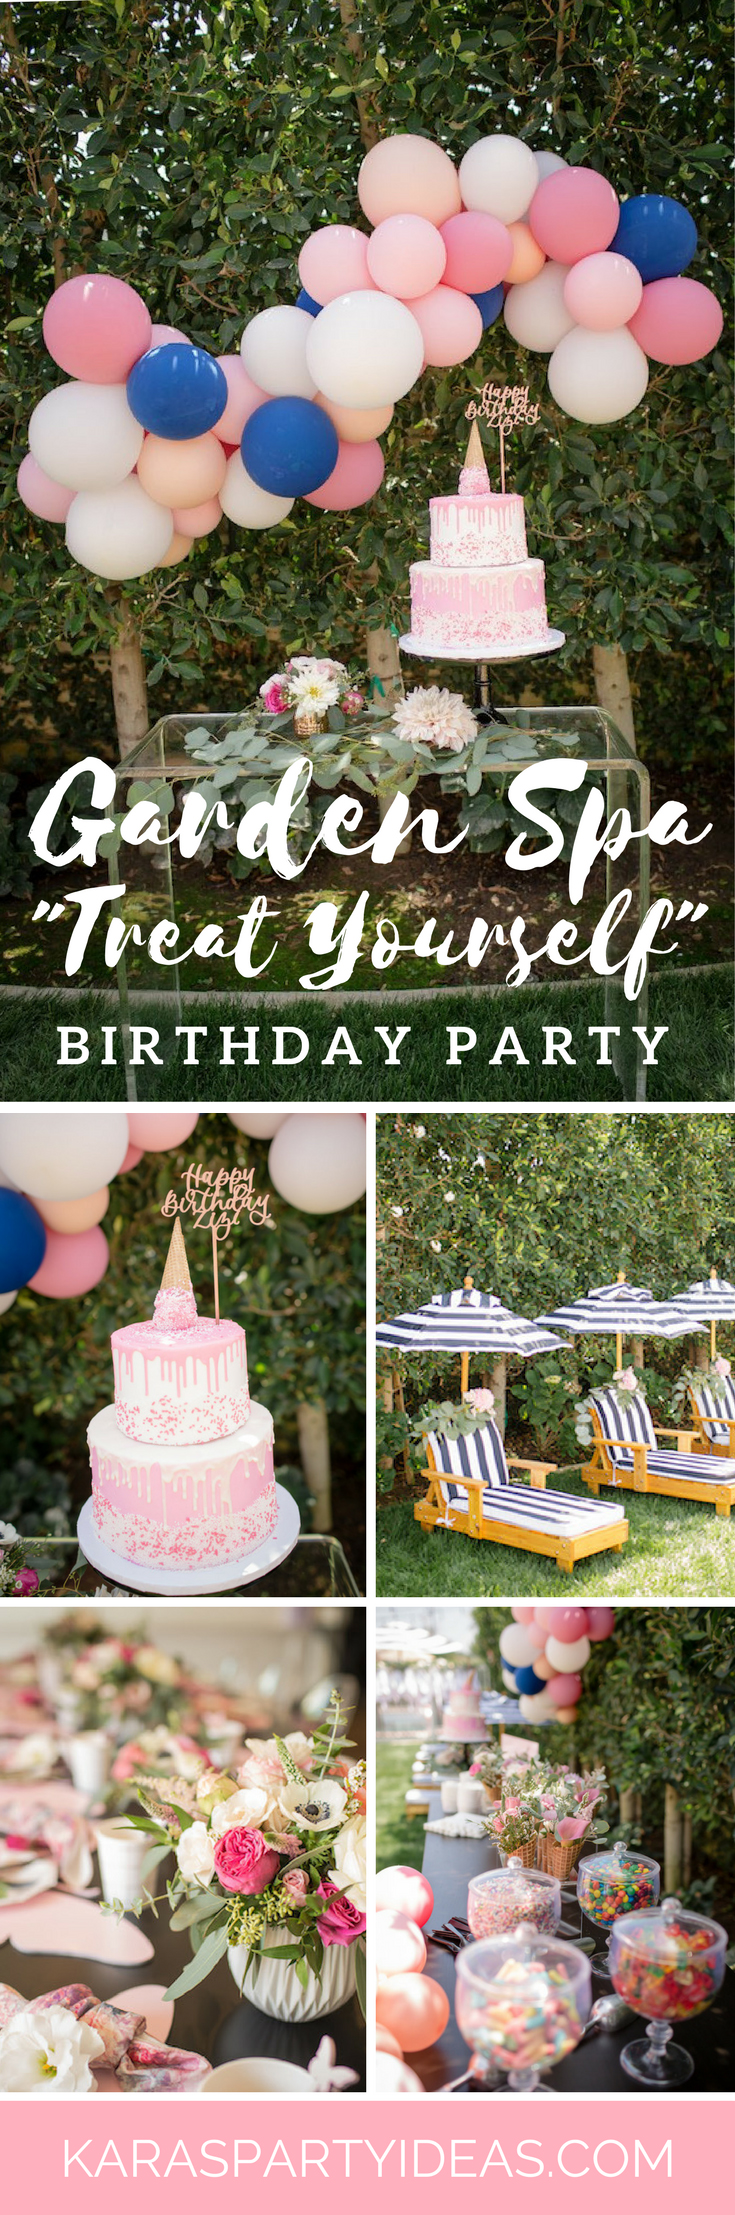 Tea time tea birthday party via kara s party ideas karaspartyideas com - Garden Spa Treat Yourself Birthday Party Via Kara S Party Ideas Karaspartyideas Com